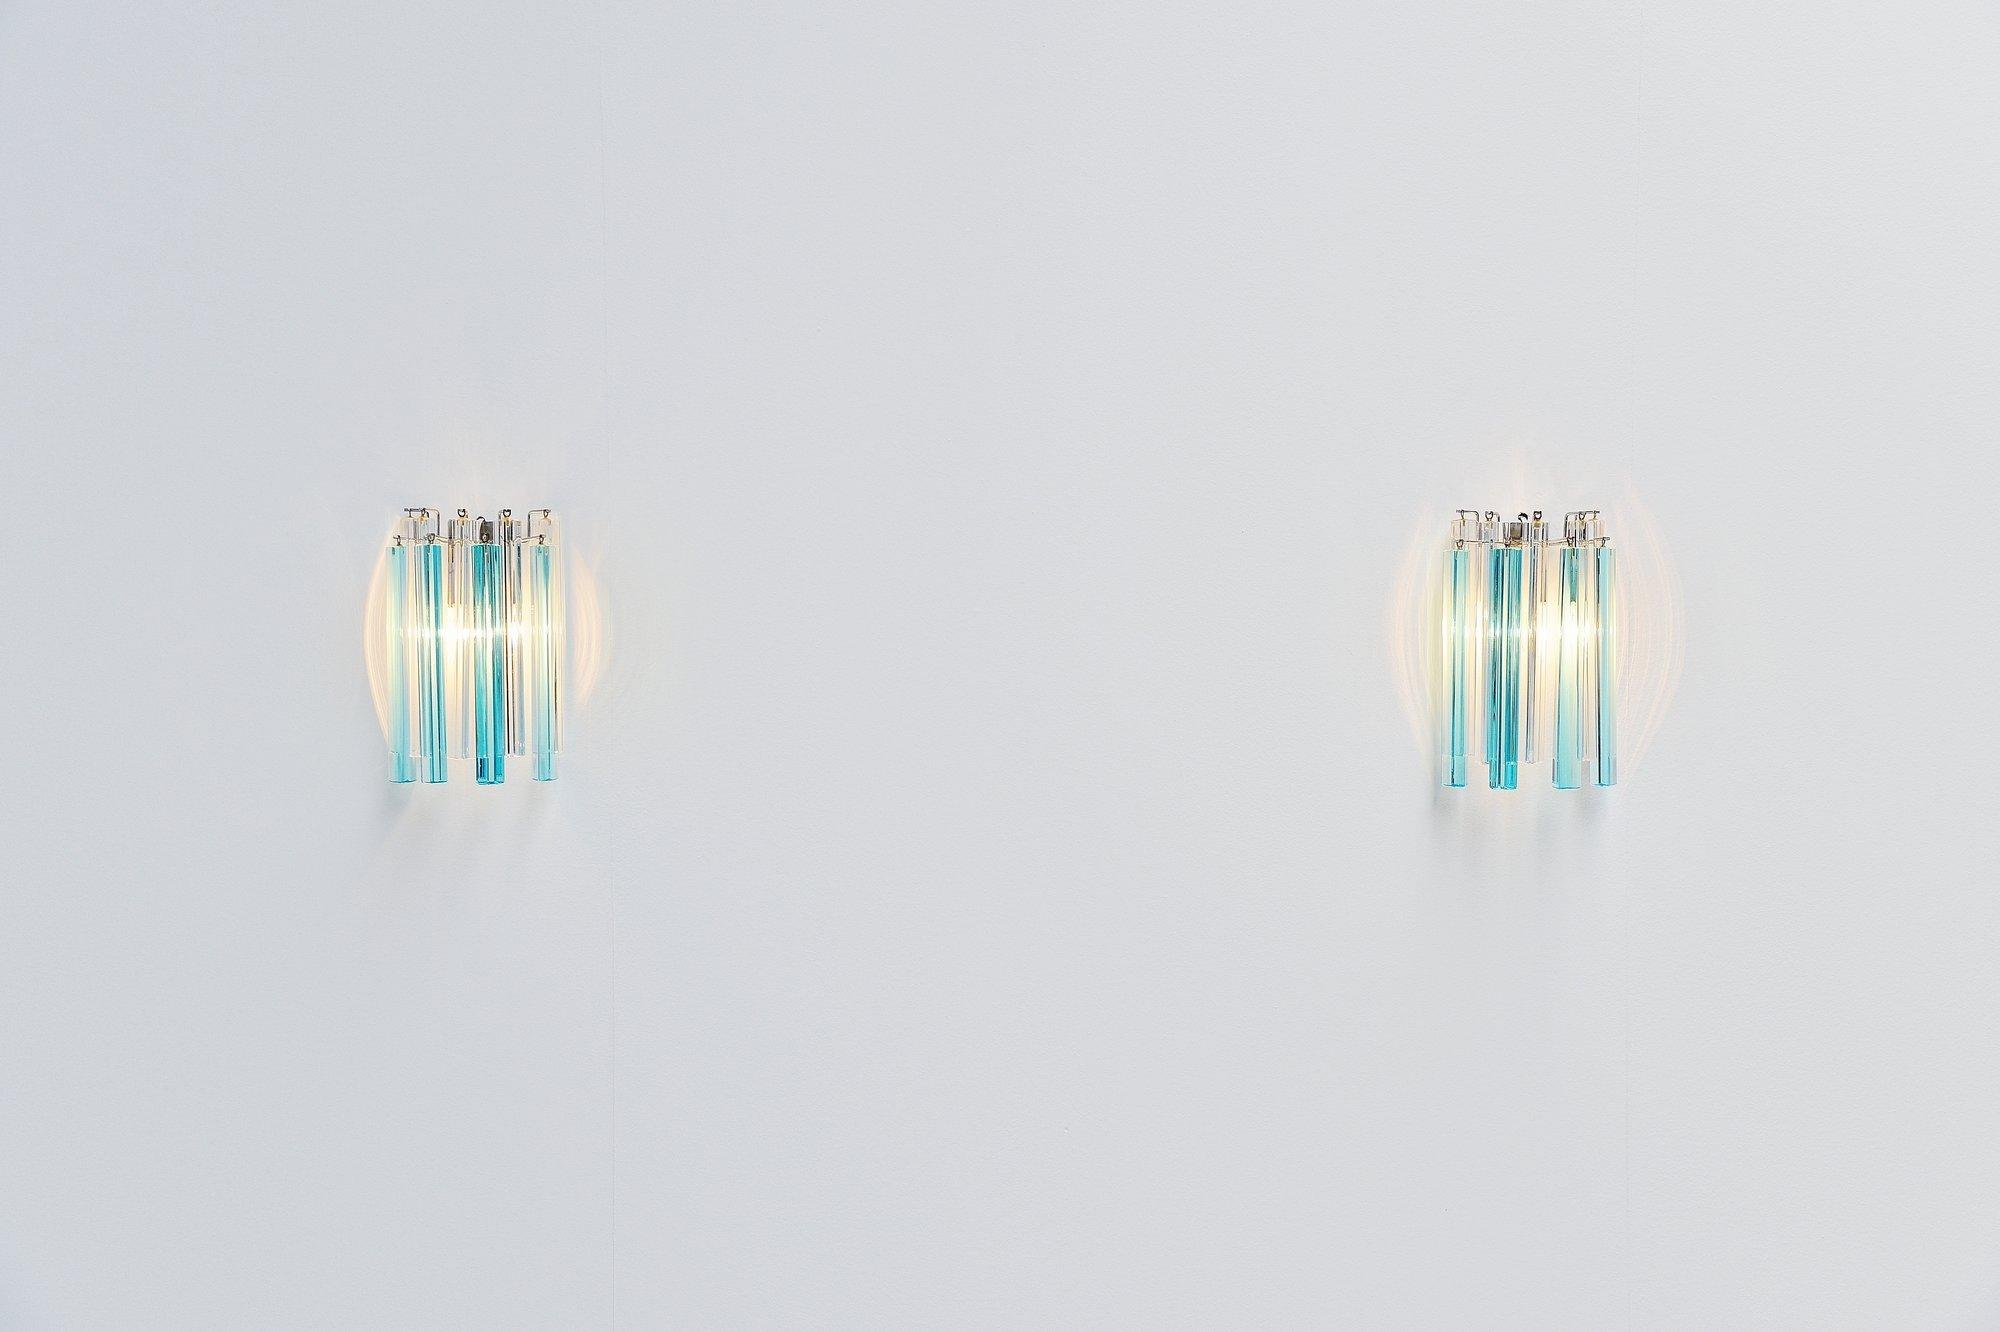 Paolo Venini Asta Triedo Sconces Italy Massmoderndesign